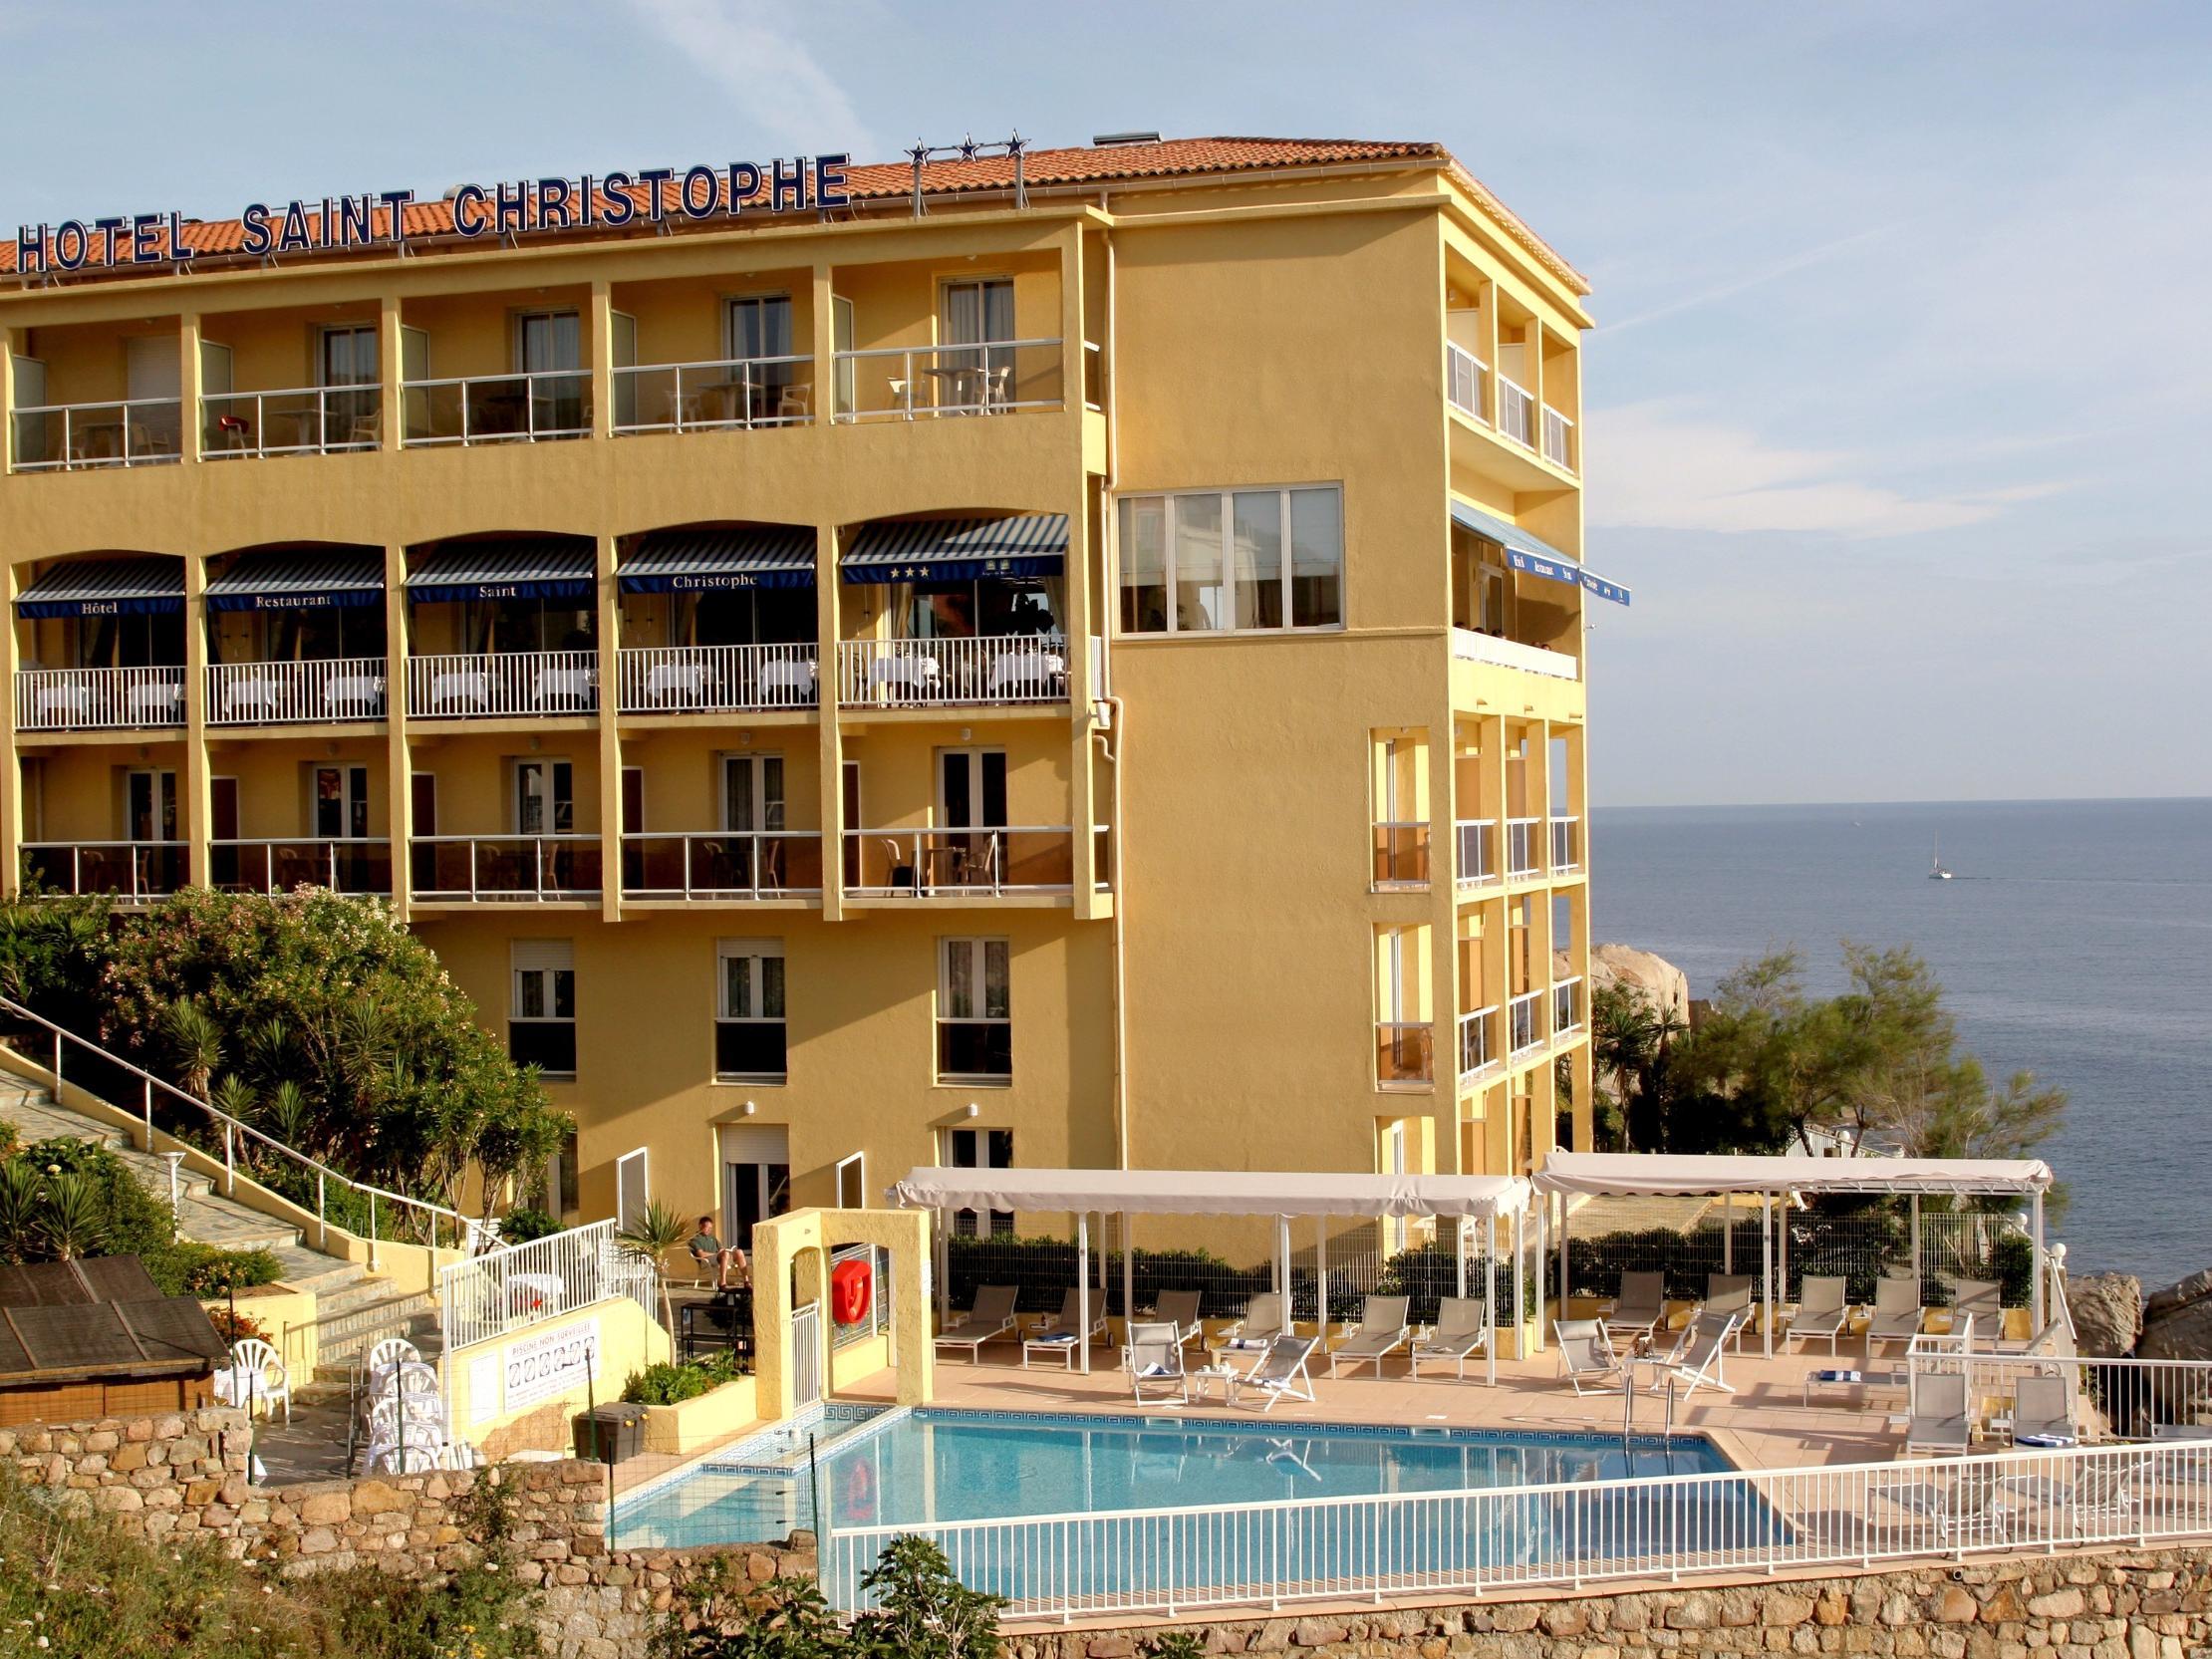 Hotels G tes et Chambres d h´tes  proximité  Port de Calvi